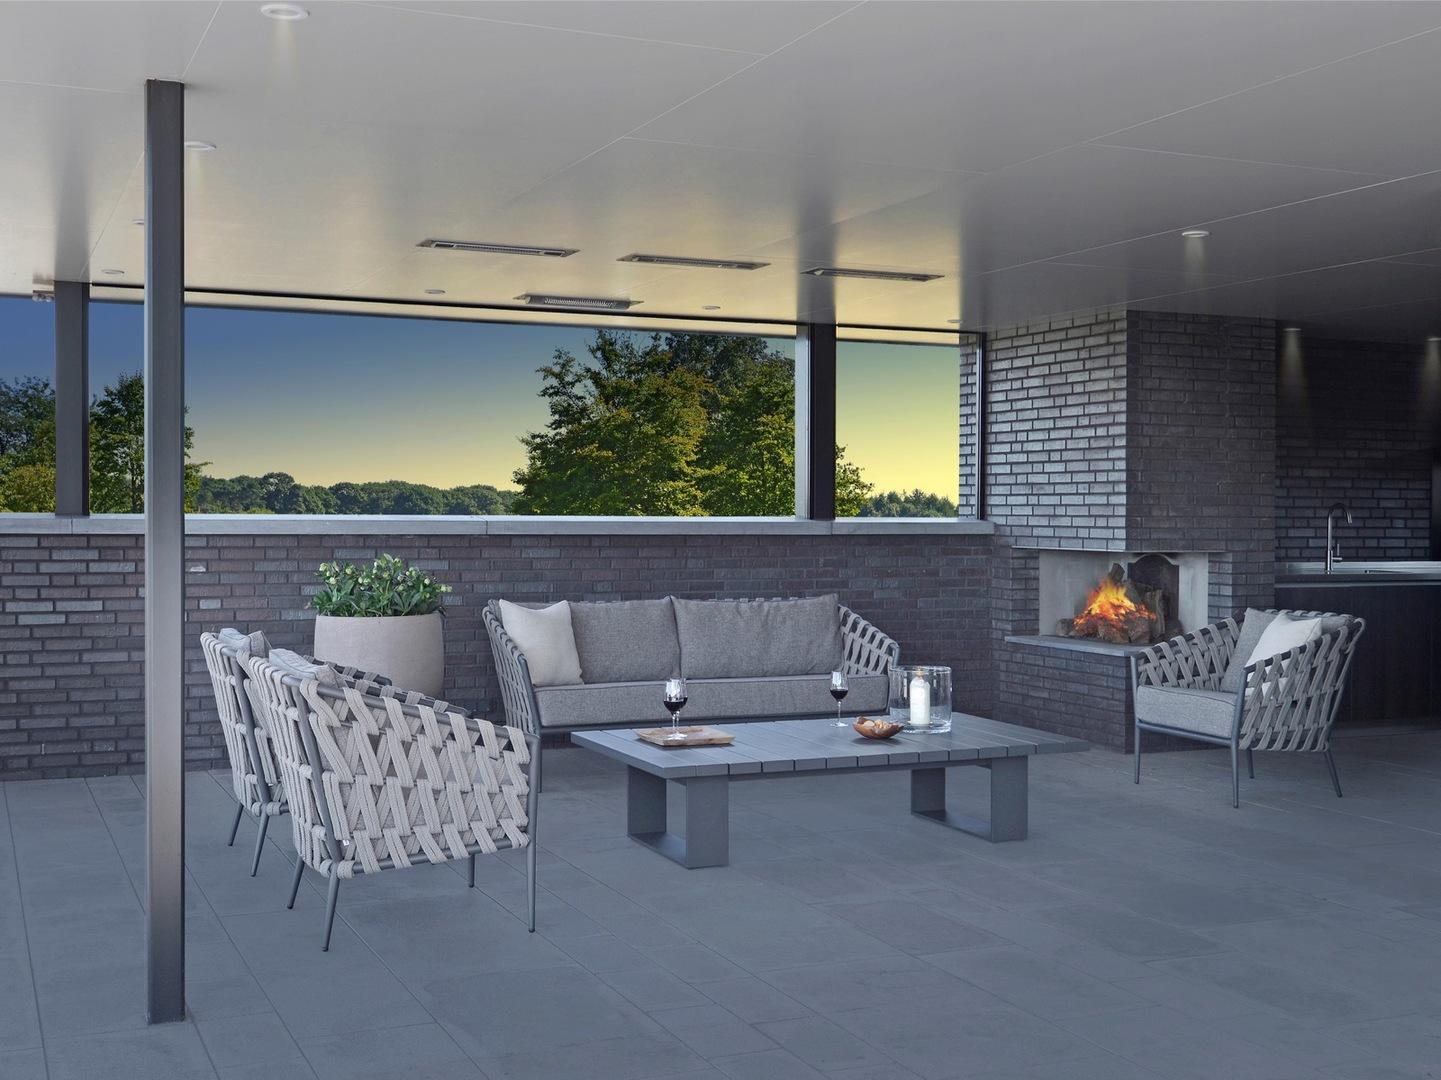 219 Borek Ardenza belt Tavira lounge chair & sofa Studio Borek - Alu Samos coffee table Studio Borek (panorama)_preview.jpg